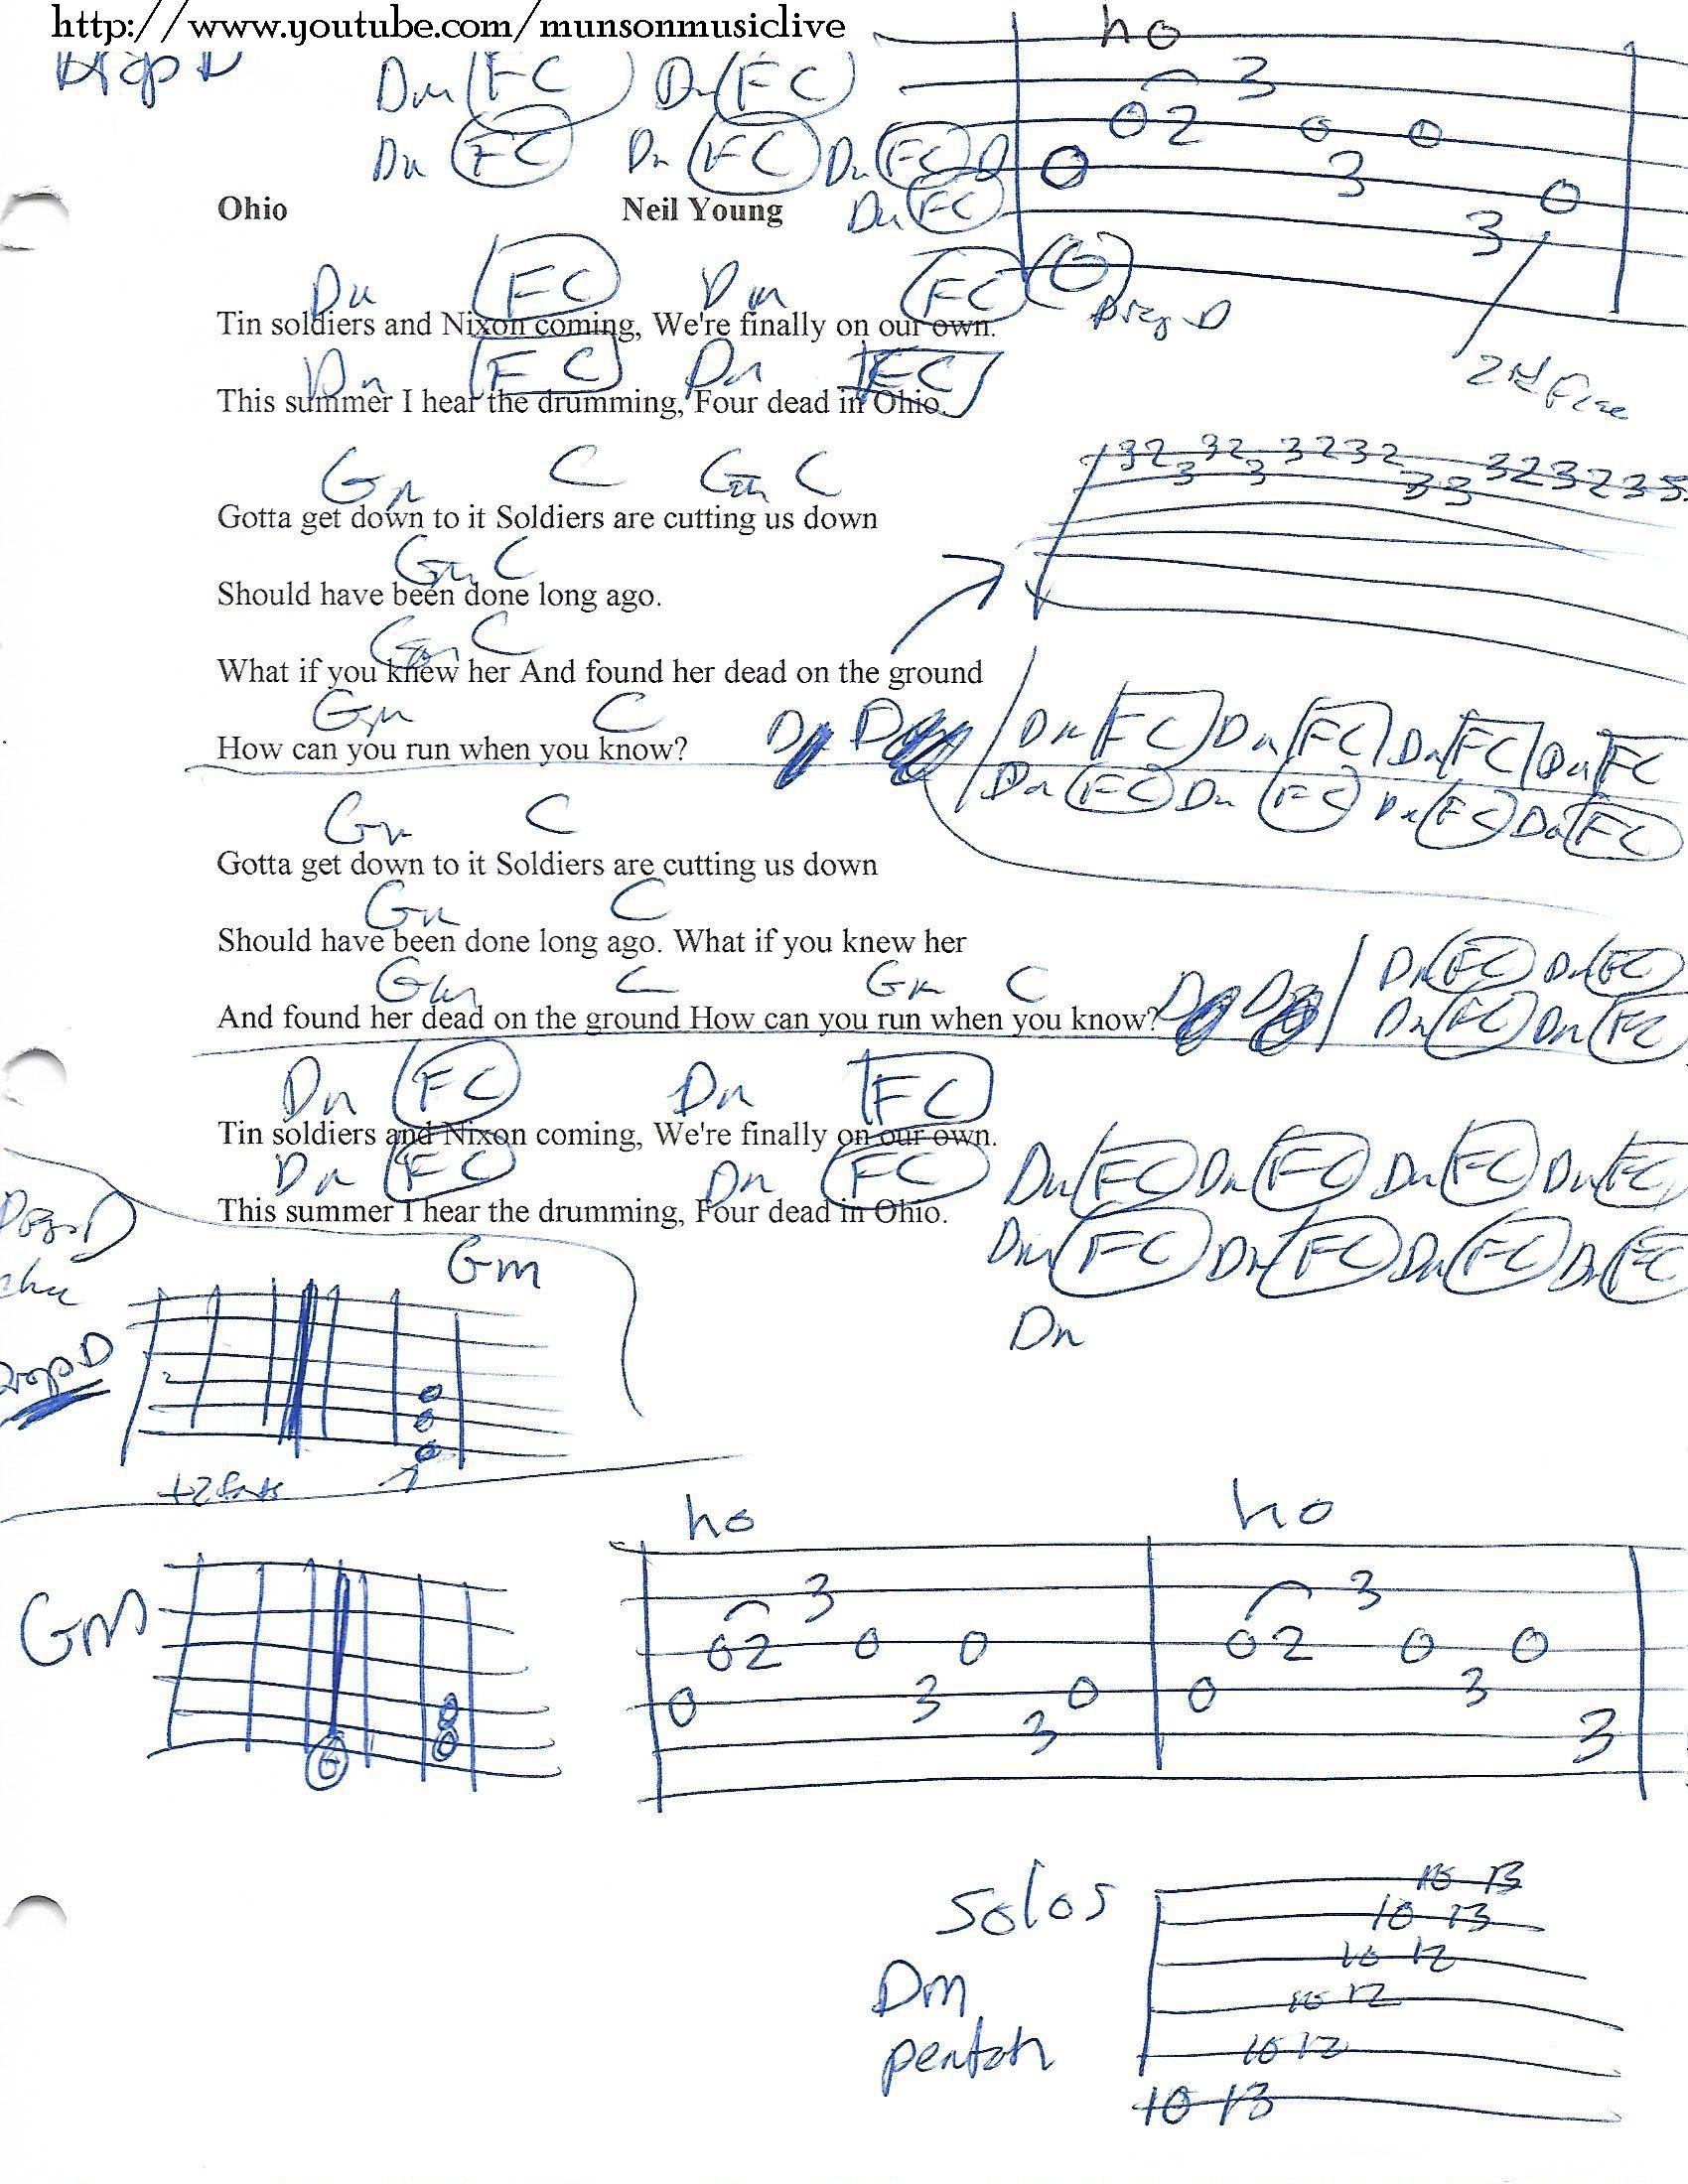 Ohio Neil Young Guitar Chord Chart Song Lyrics And Chords Guitar Lessons Songs Lyrics And Chords